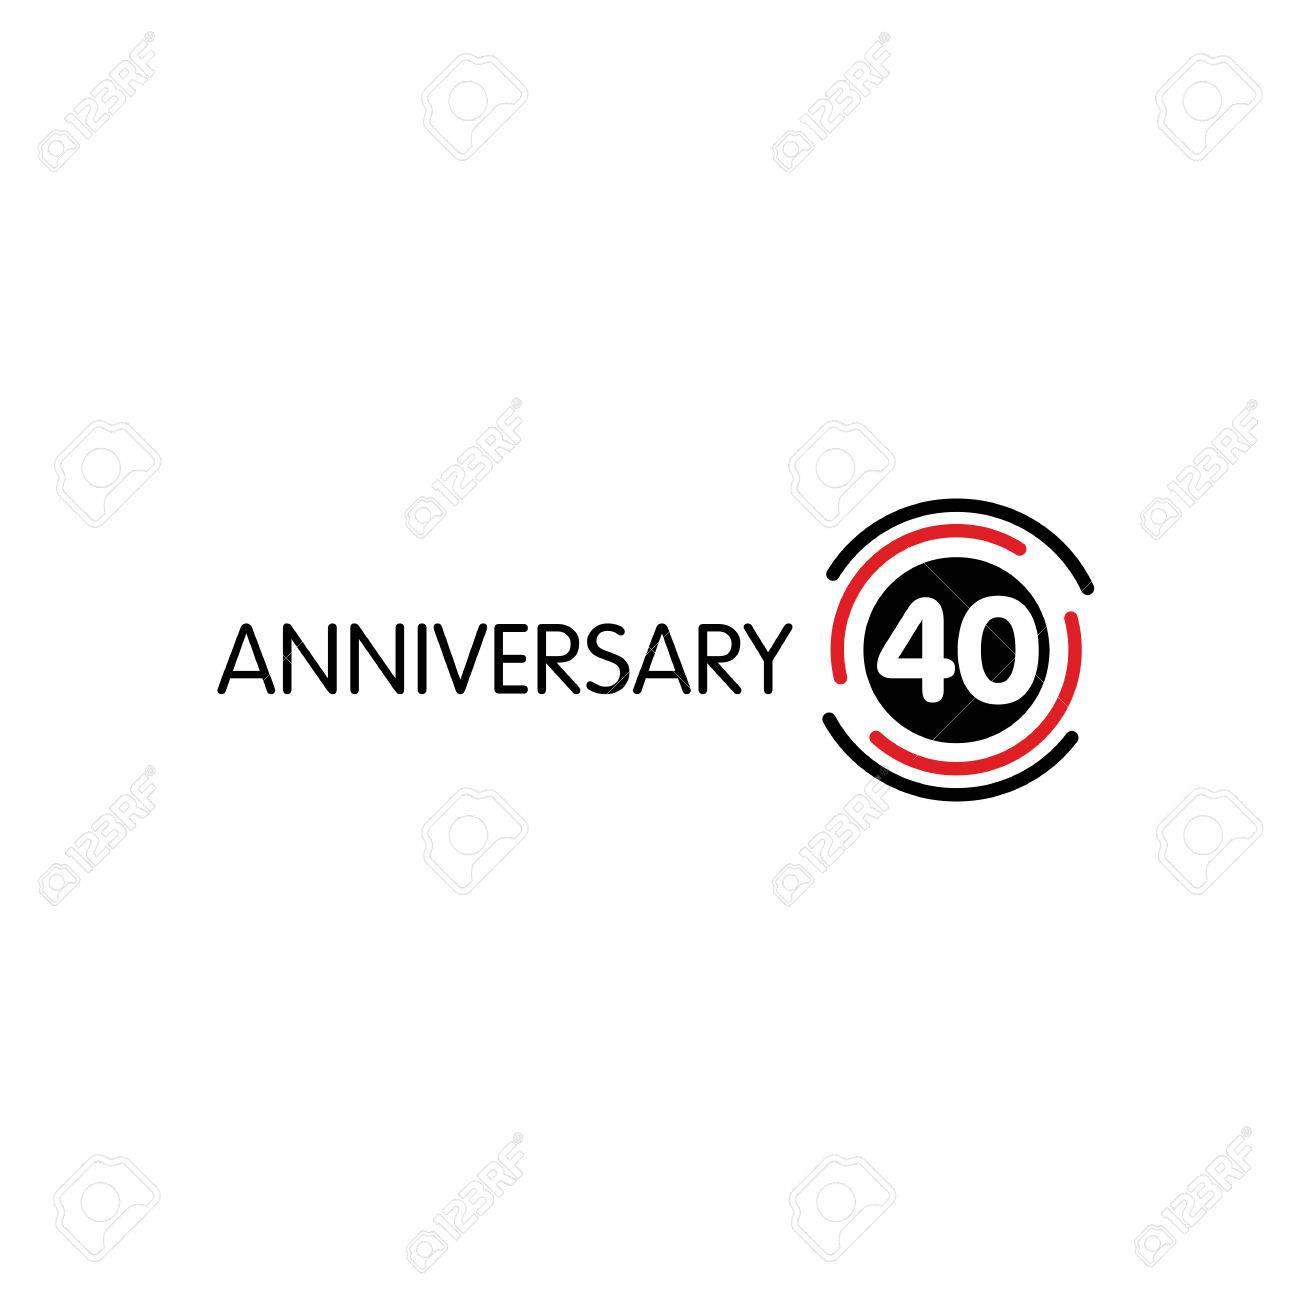 Anniversary Vector Unusual Label Fortieth Anniversary Symbol